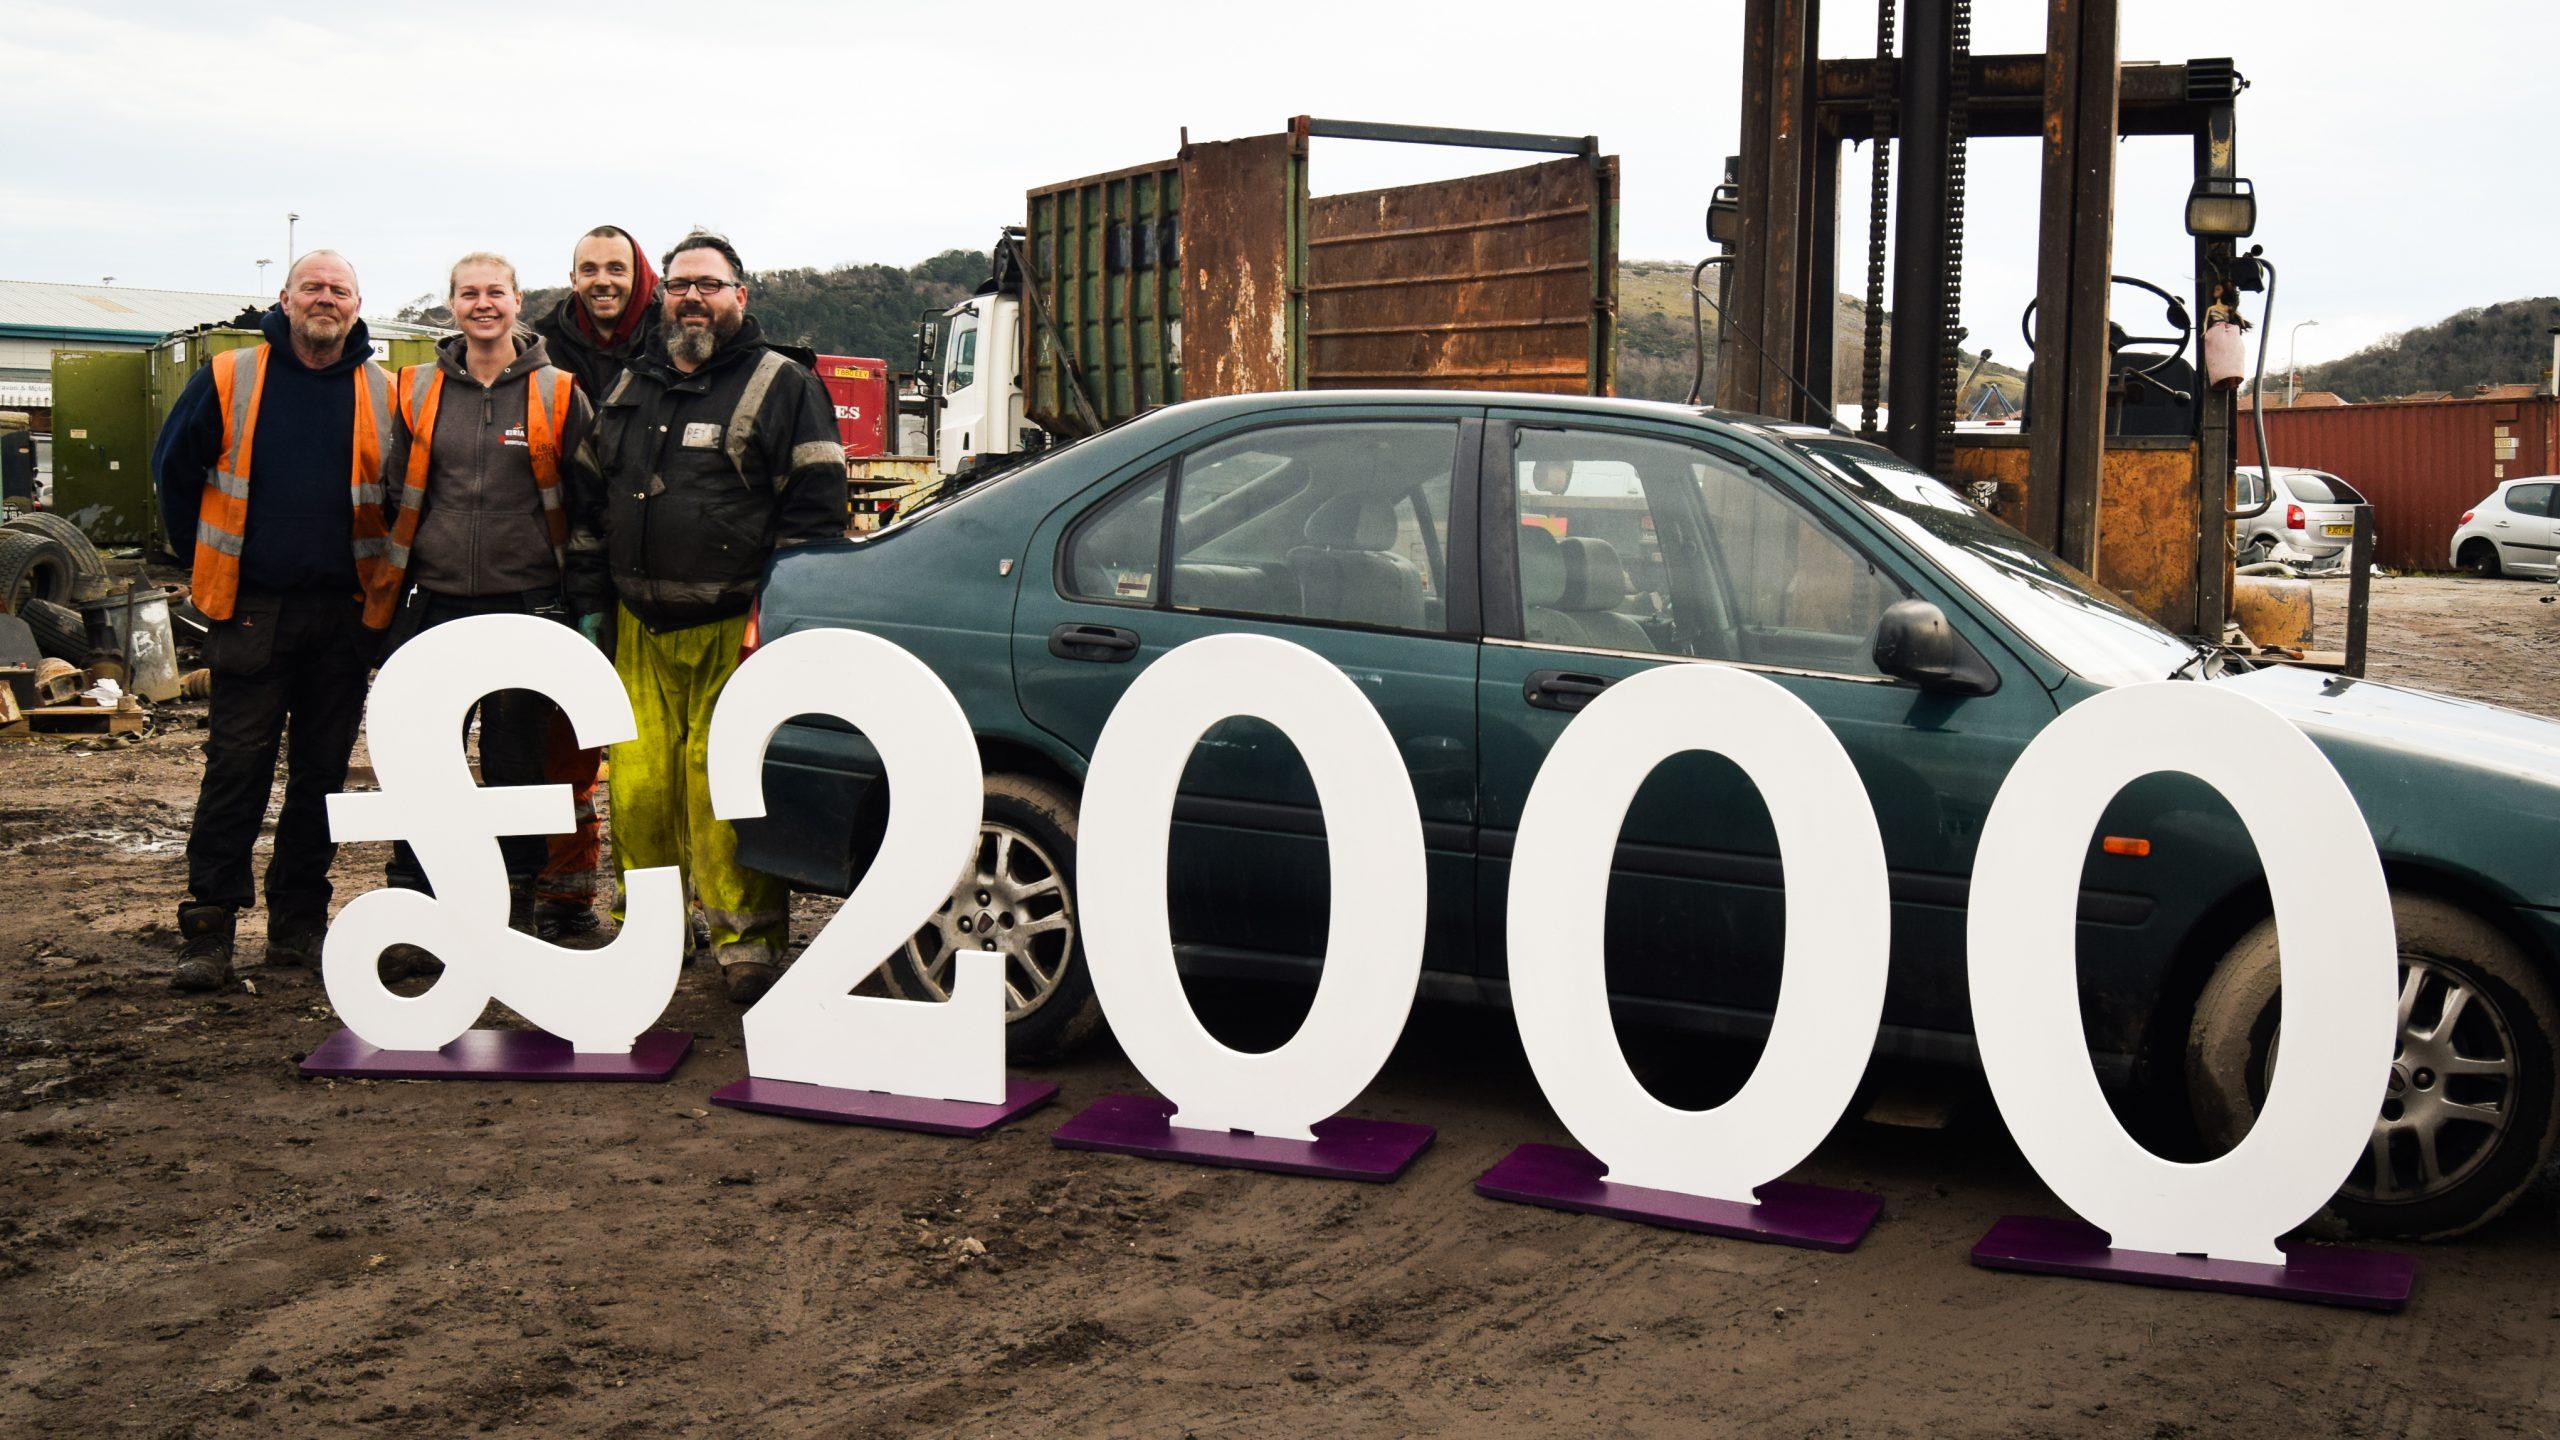 Llandudno scrapyard donates thousands to local adult hospice